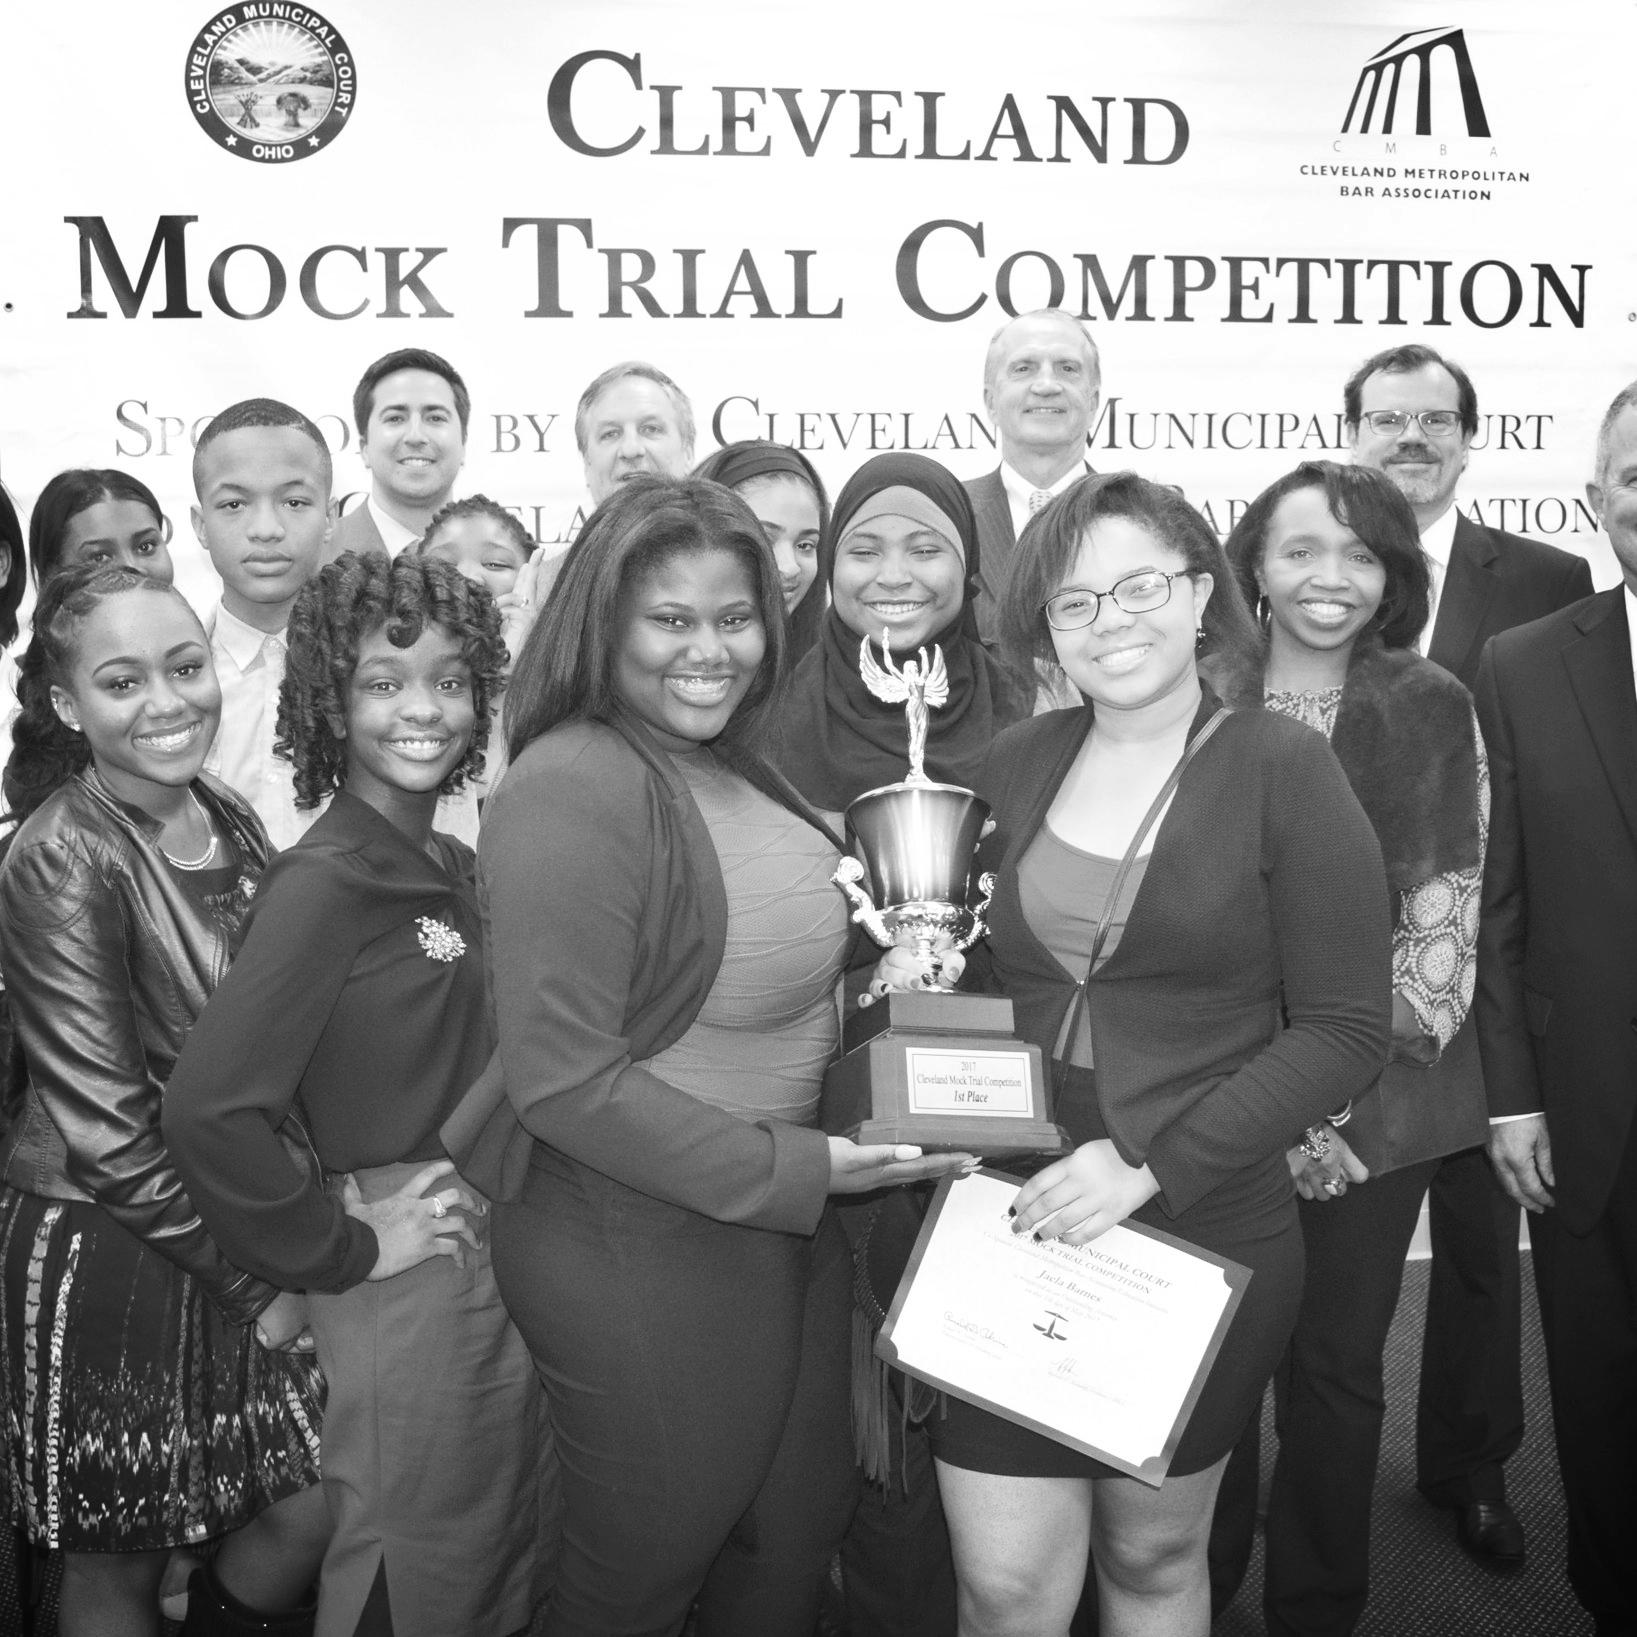 Cleveland Metropolitan Bar Foundation